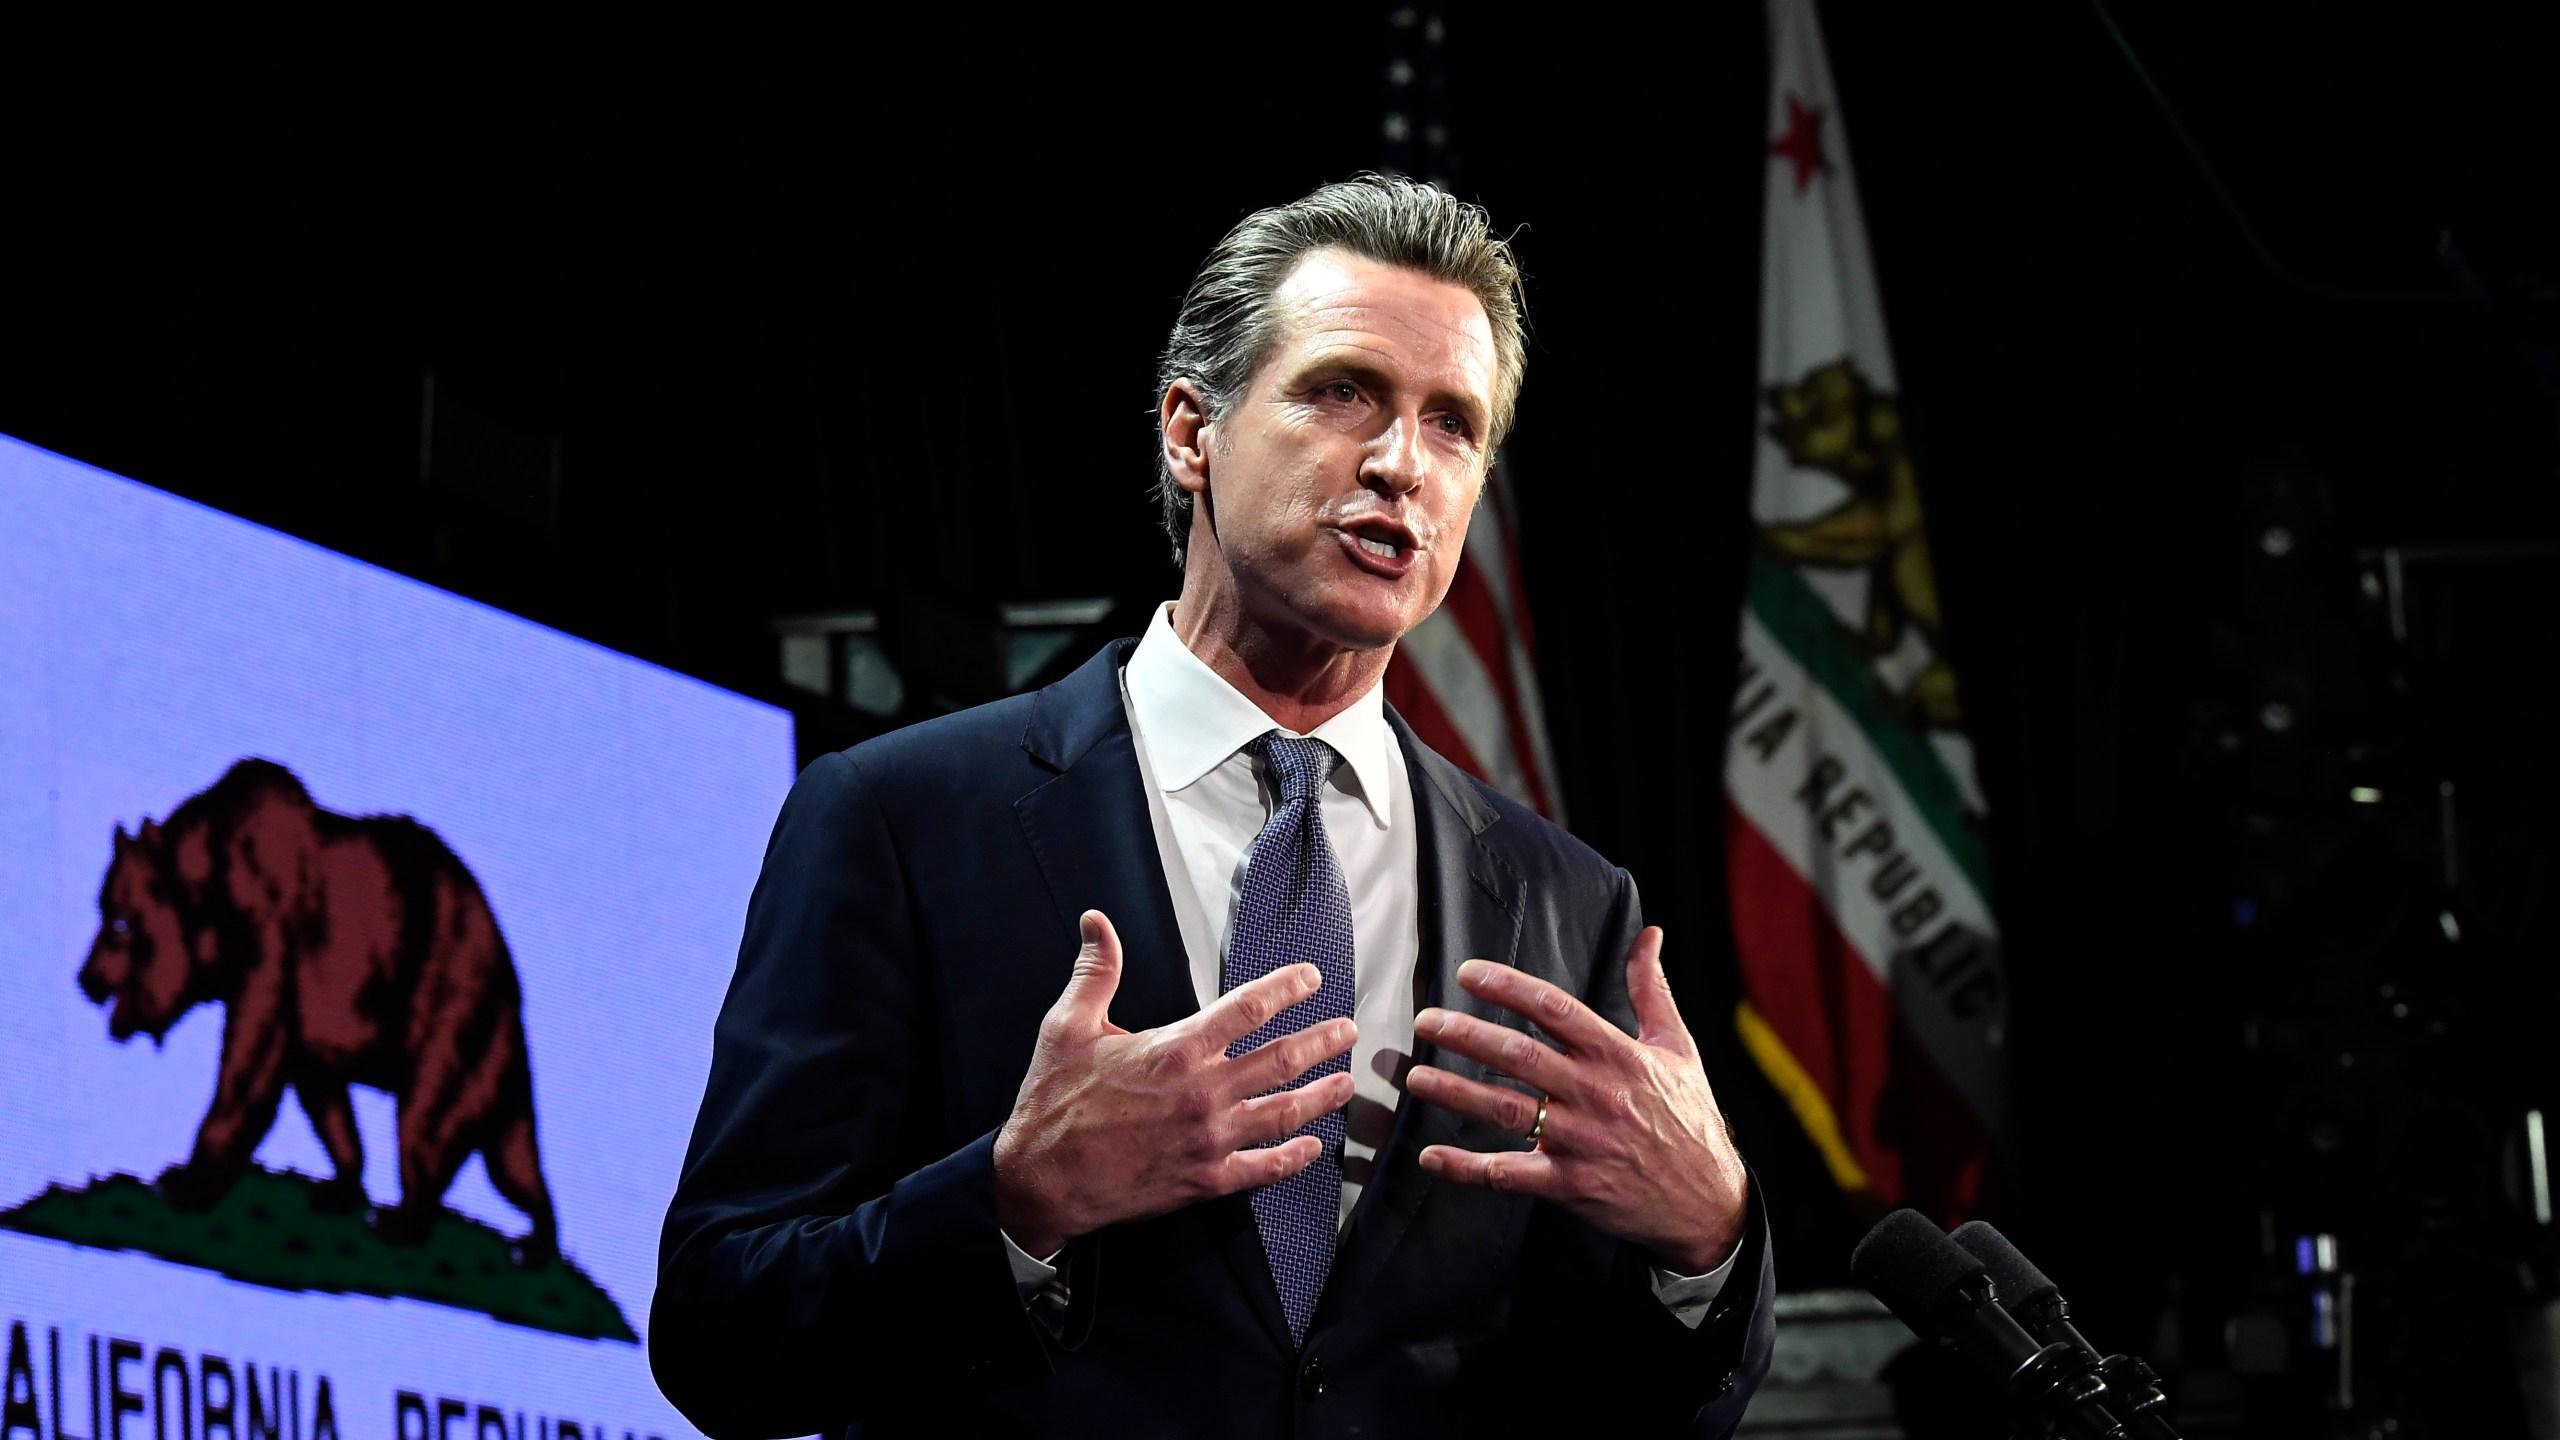 Democratic gubernatorial candidate Gavin Newsom speaks during his election-night event in Los Angeles on Nov. 6, 2018. (Credit: Kevork Djansezian / Getty Images)